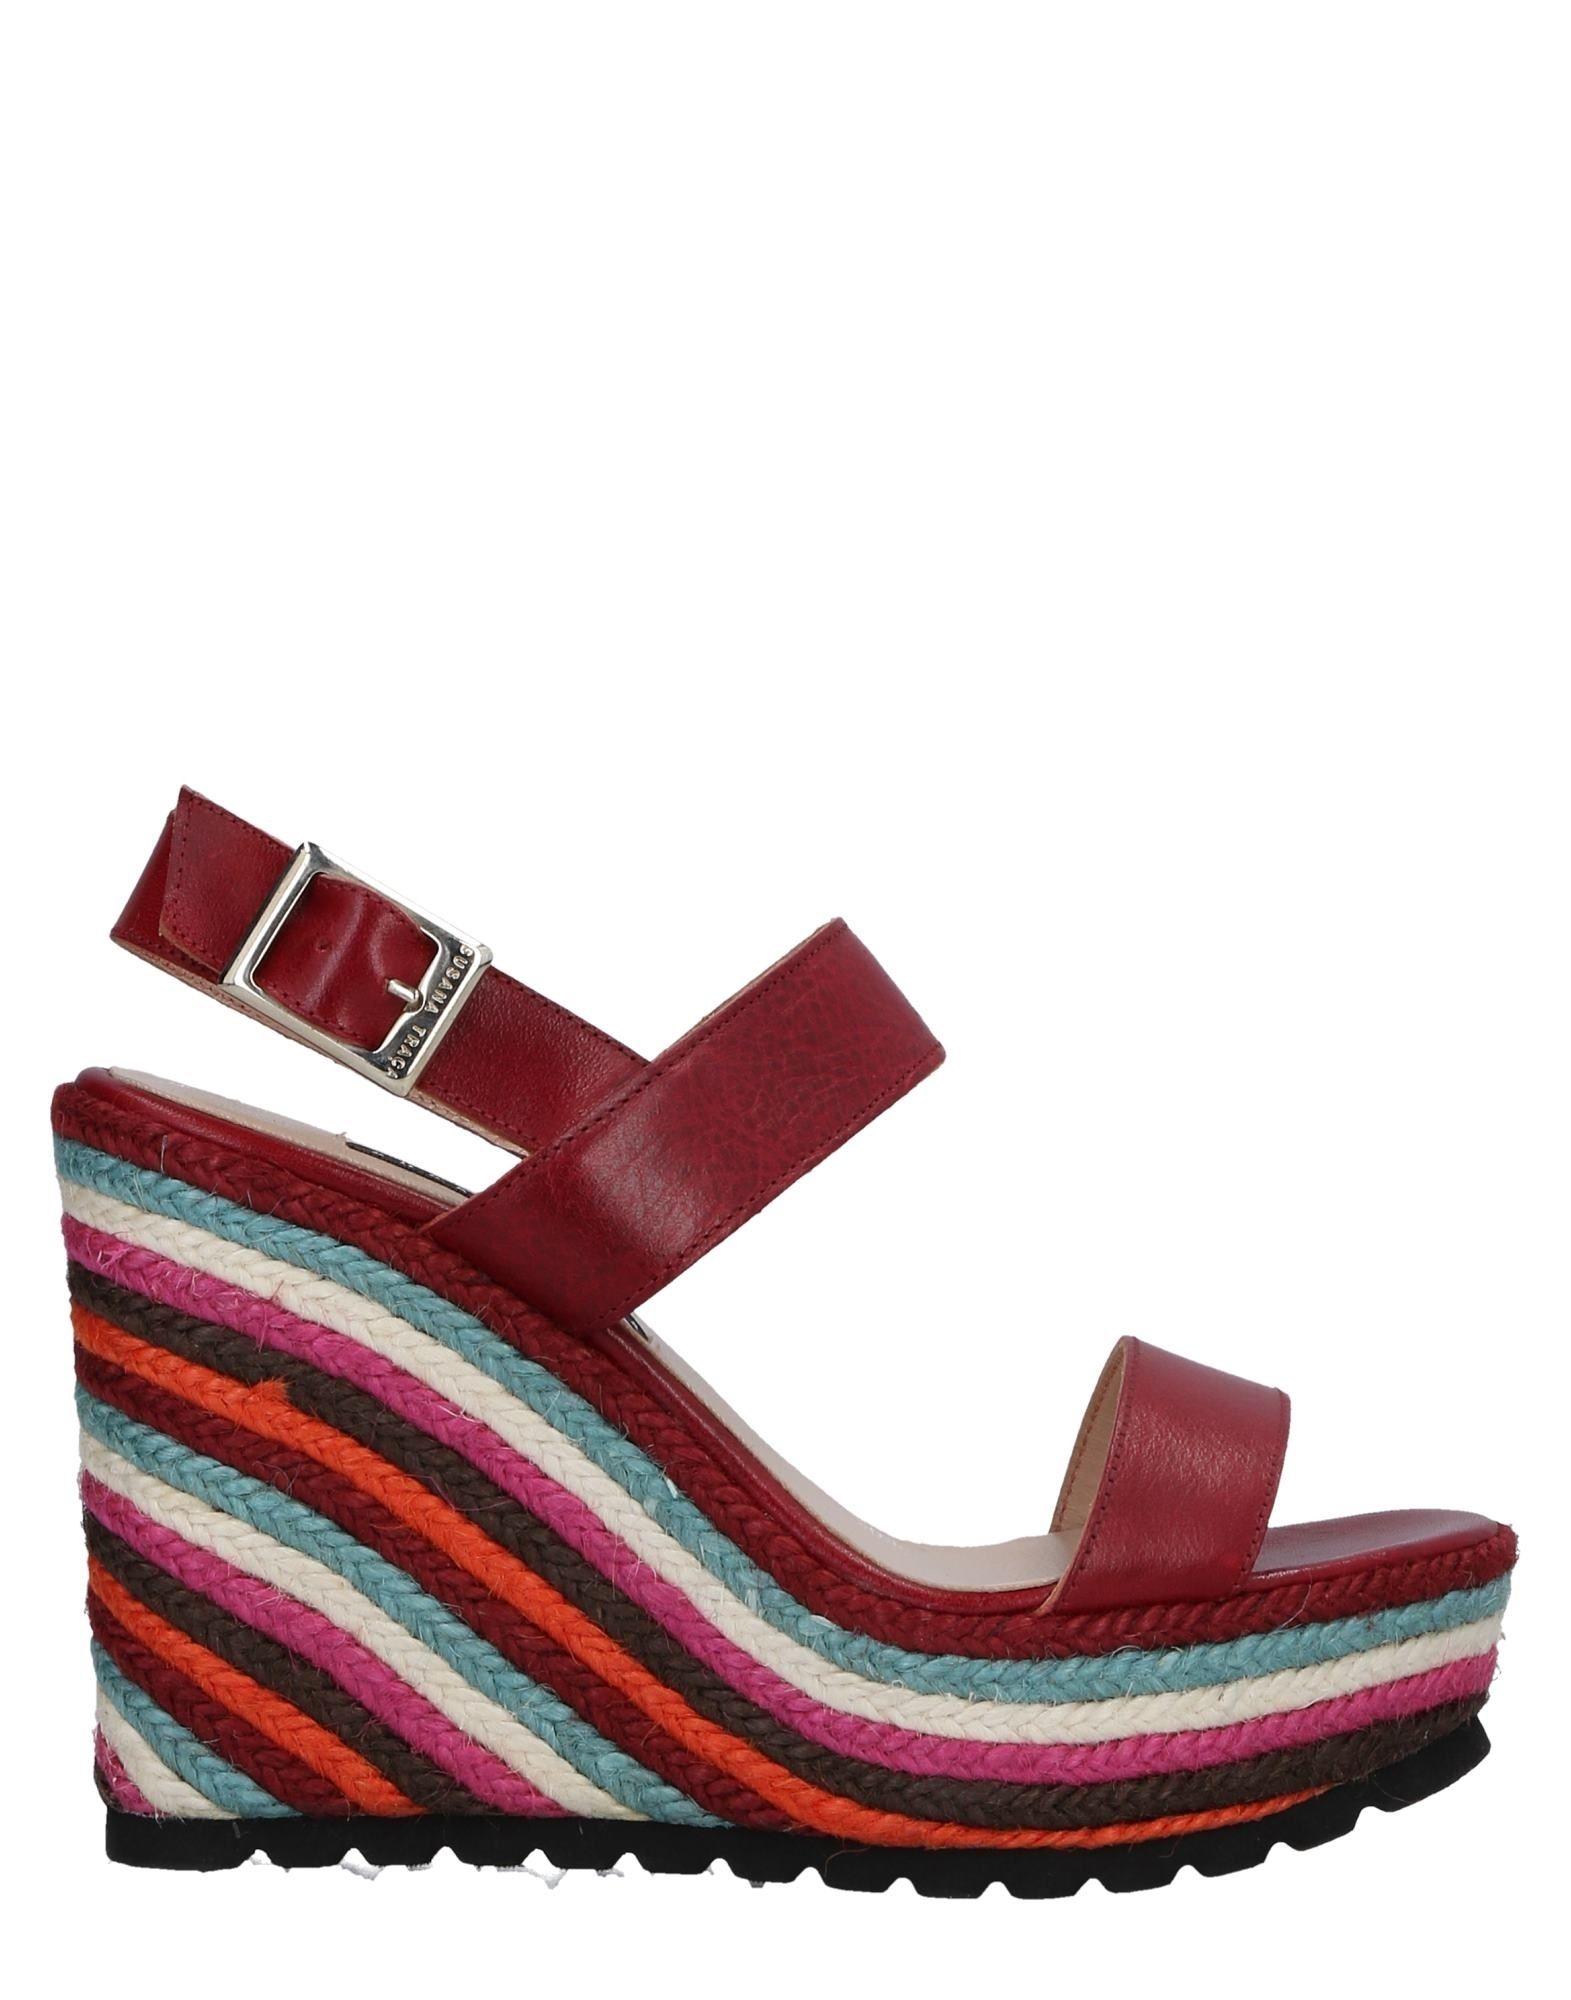 Susana Traca Sandals Sandals - Women Susana Traca Sandals Sandals online on  Canada - 11512860PO 429716